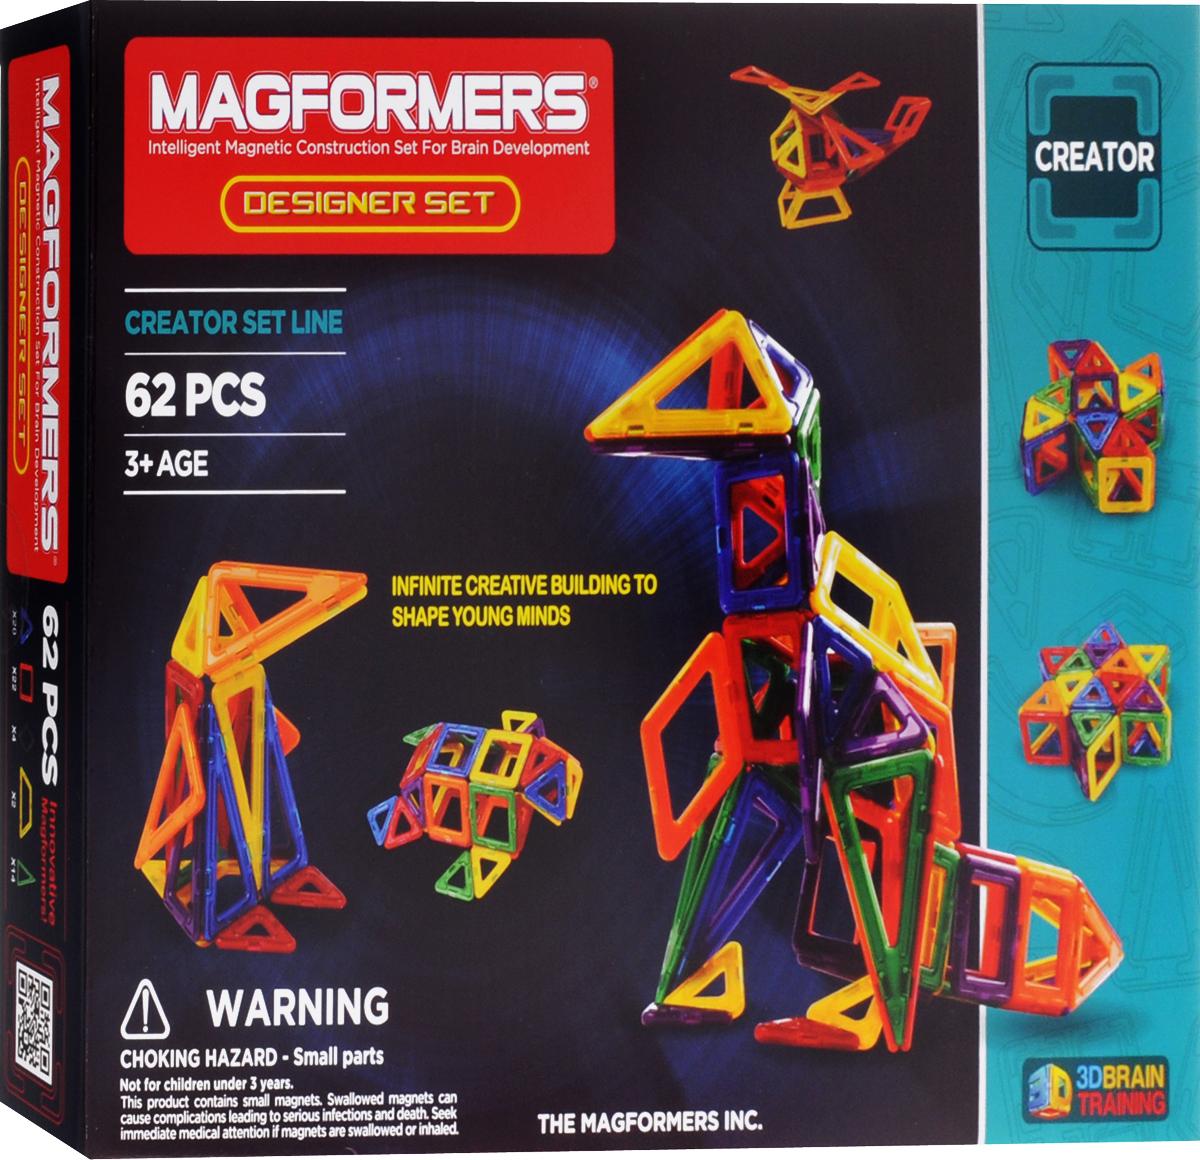 Magformers Магнитный конструктор Designer Set